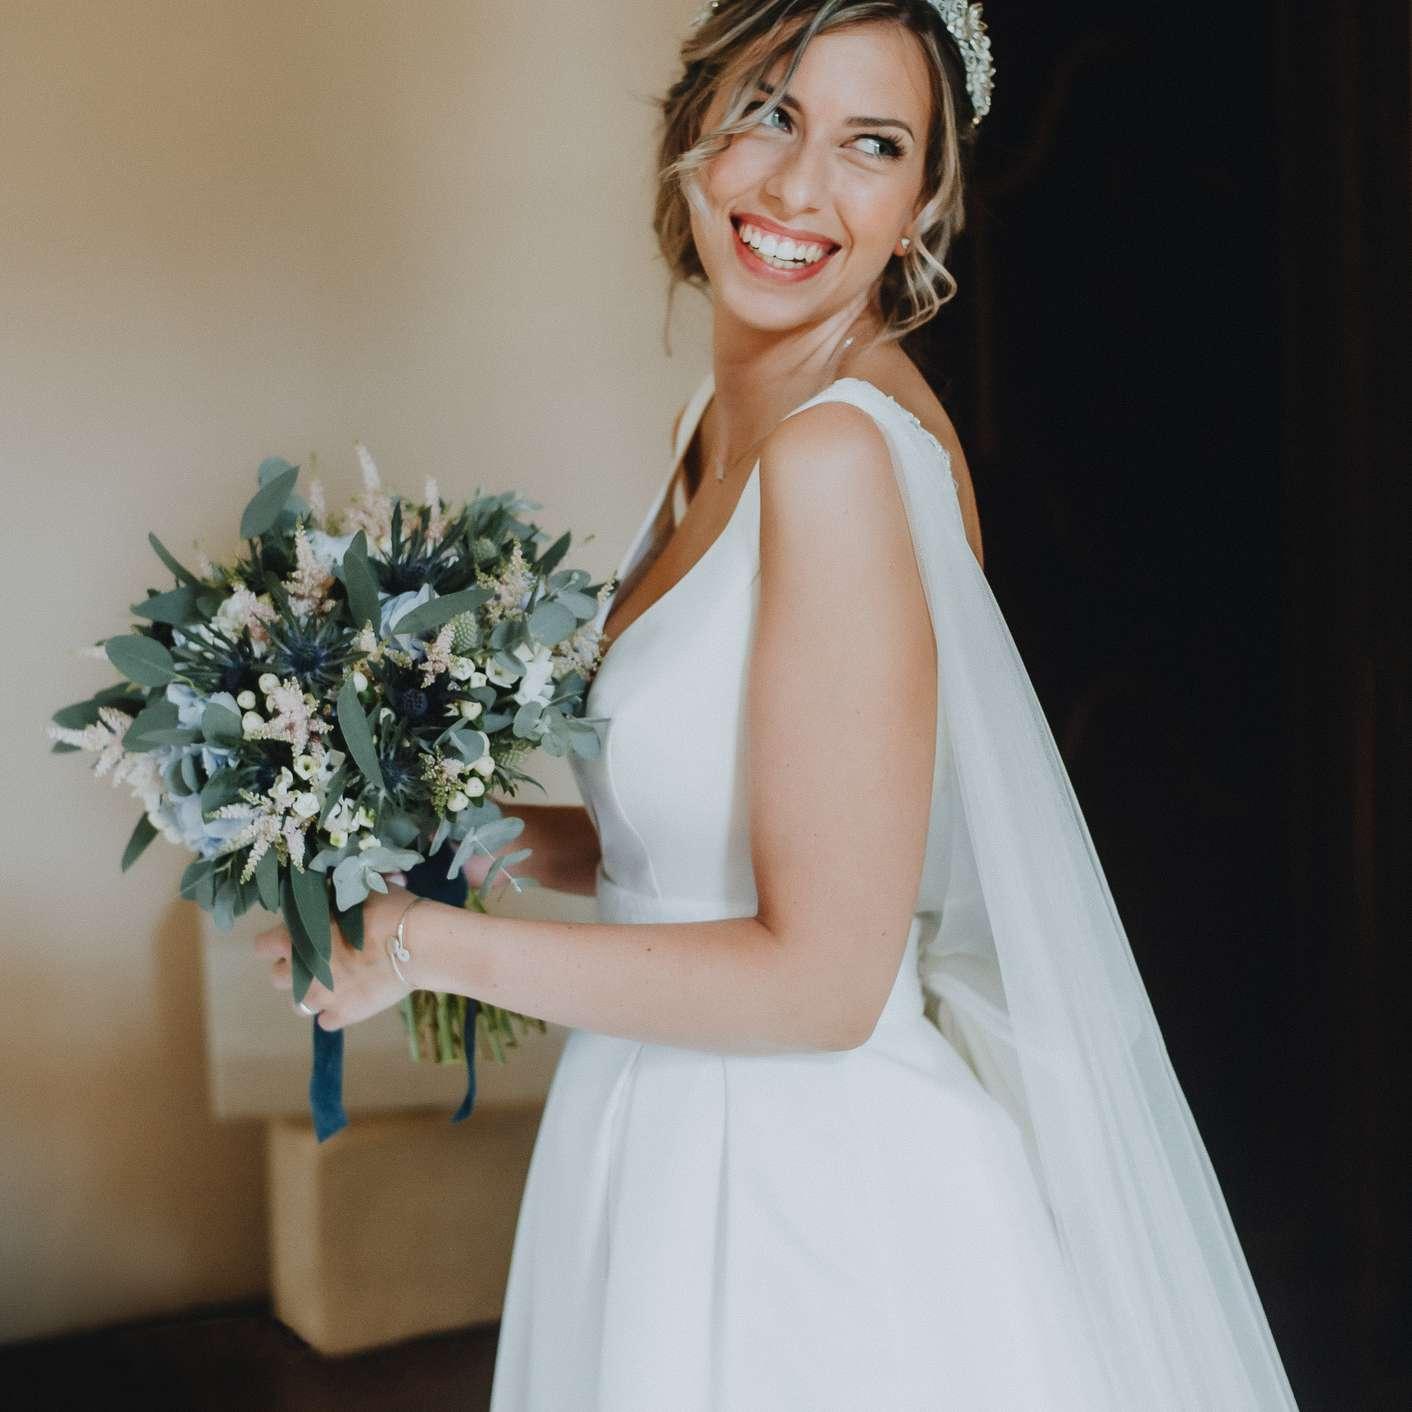 woman on wedding day